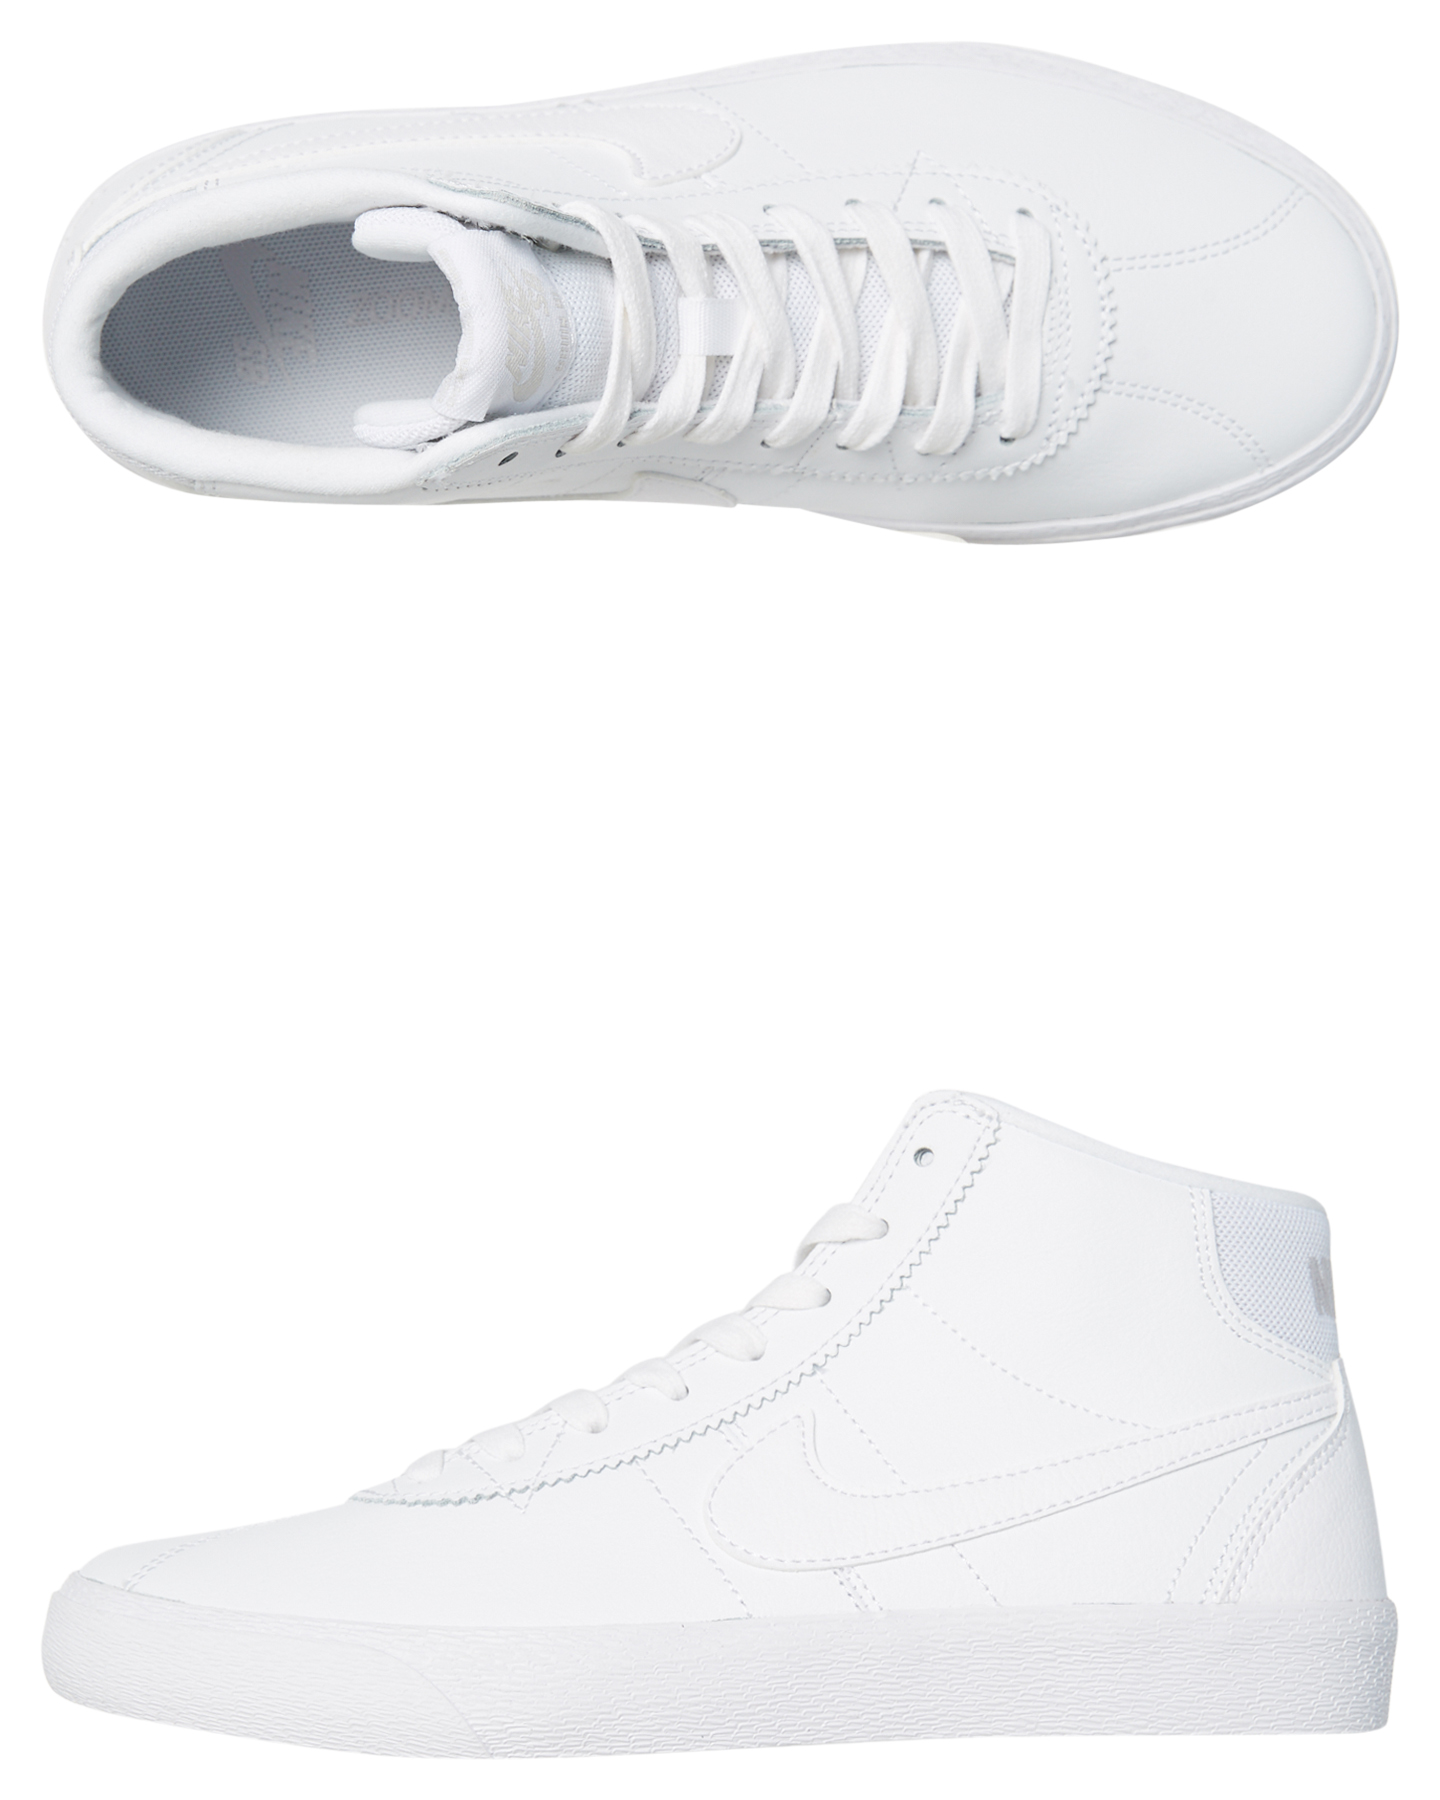 3745c57e7b Nike Sb Bruin Hi Skateboarding Womens Shoe White Womens Sneakers ...